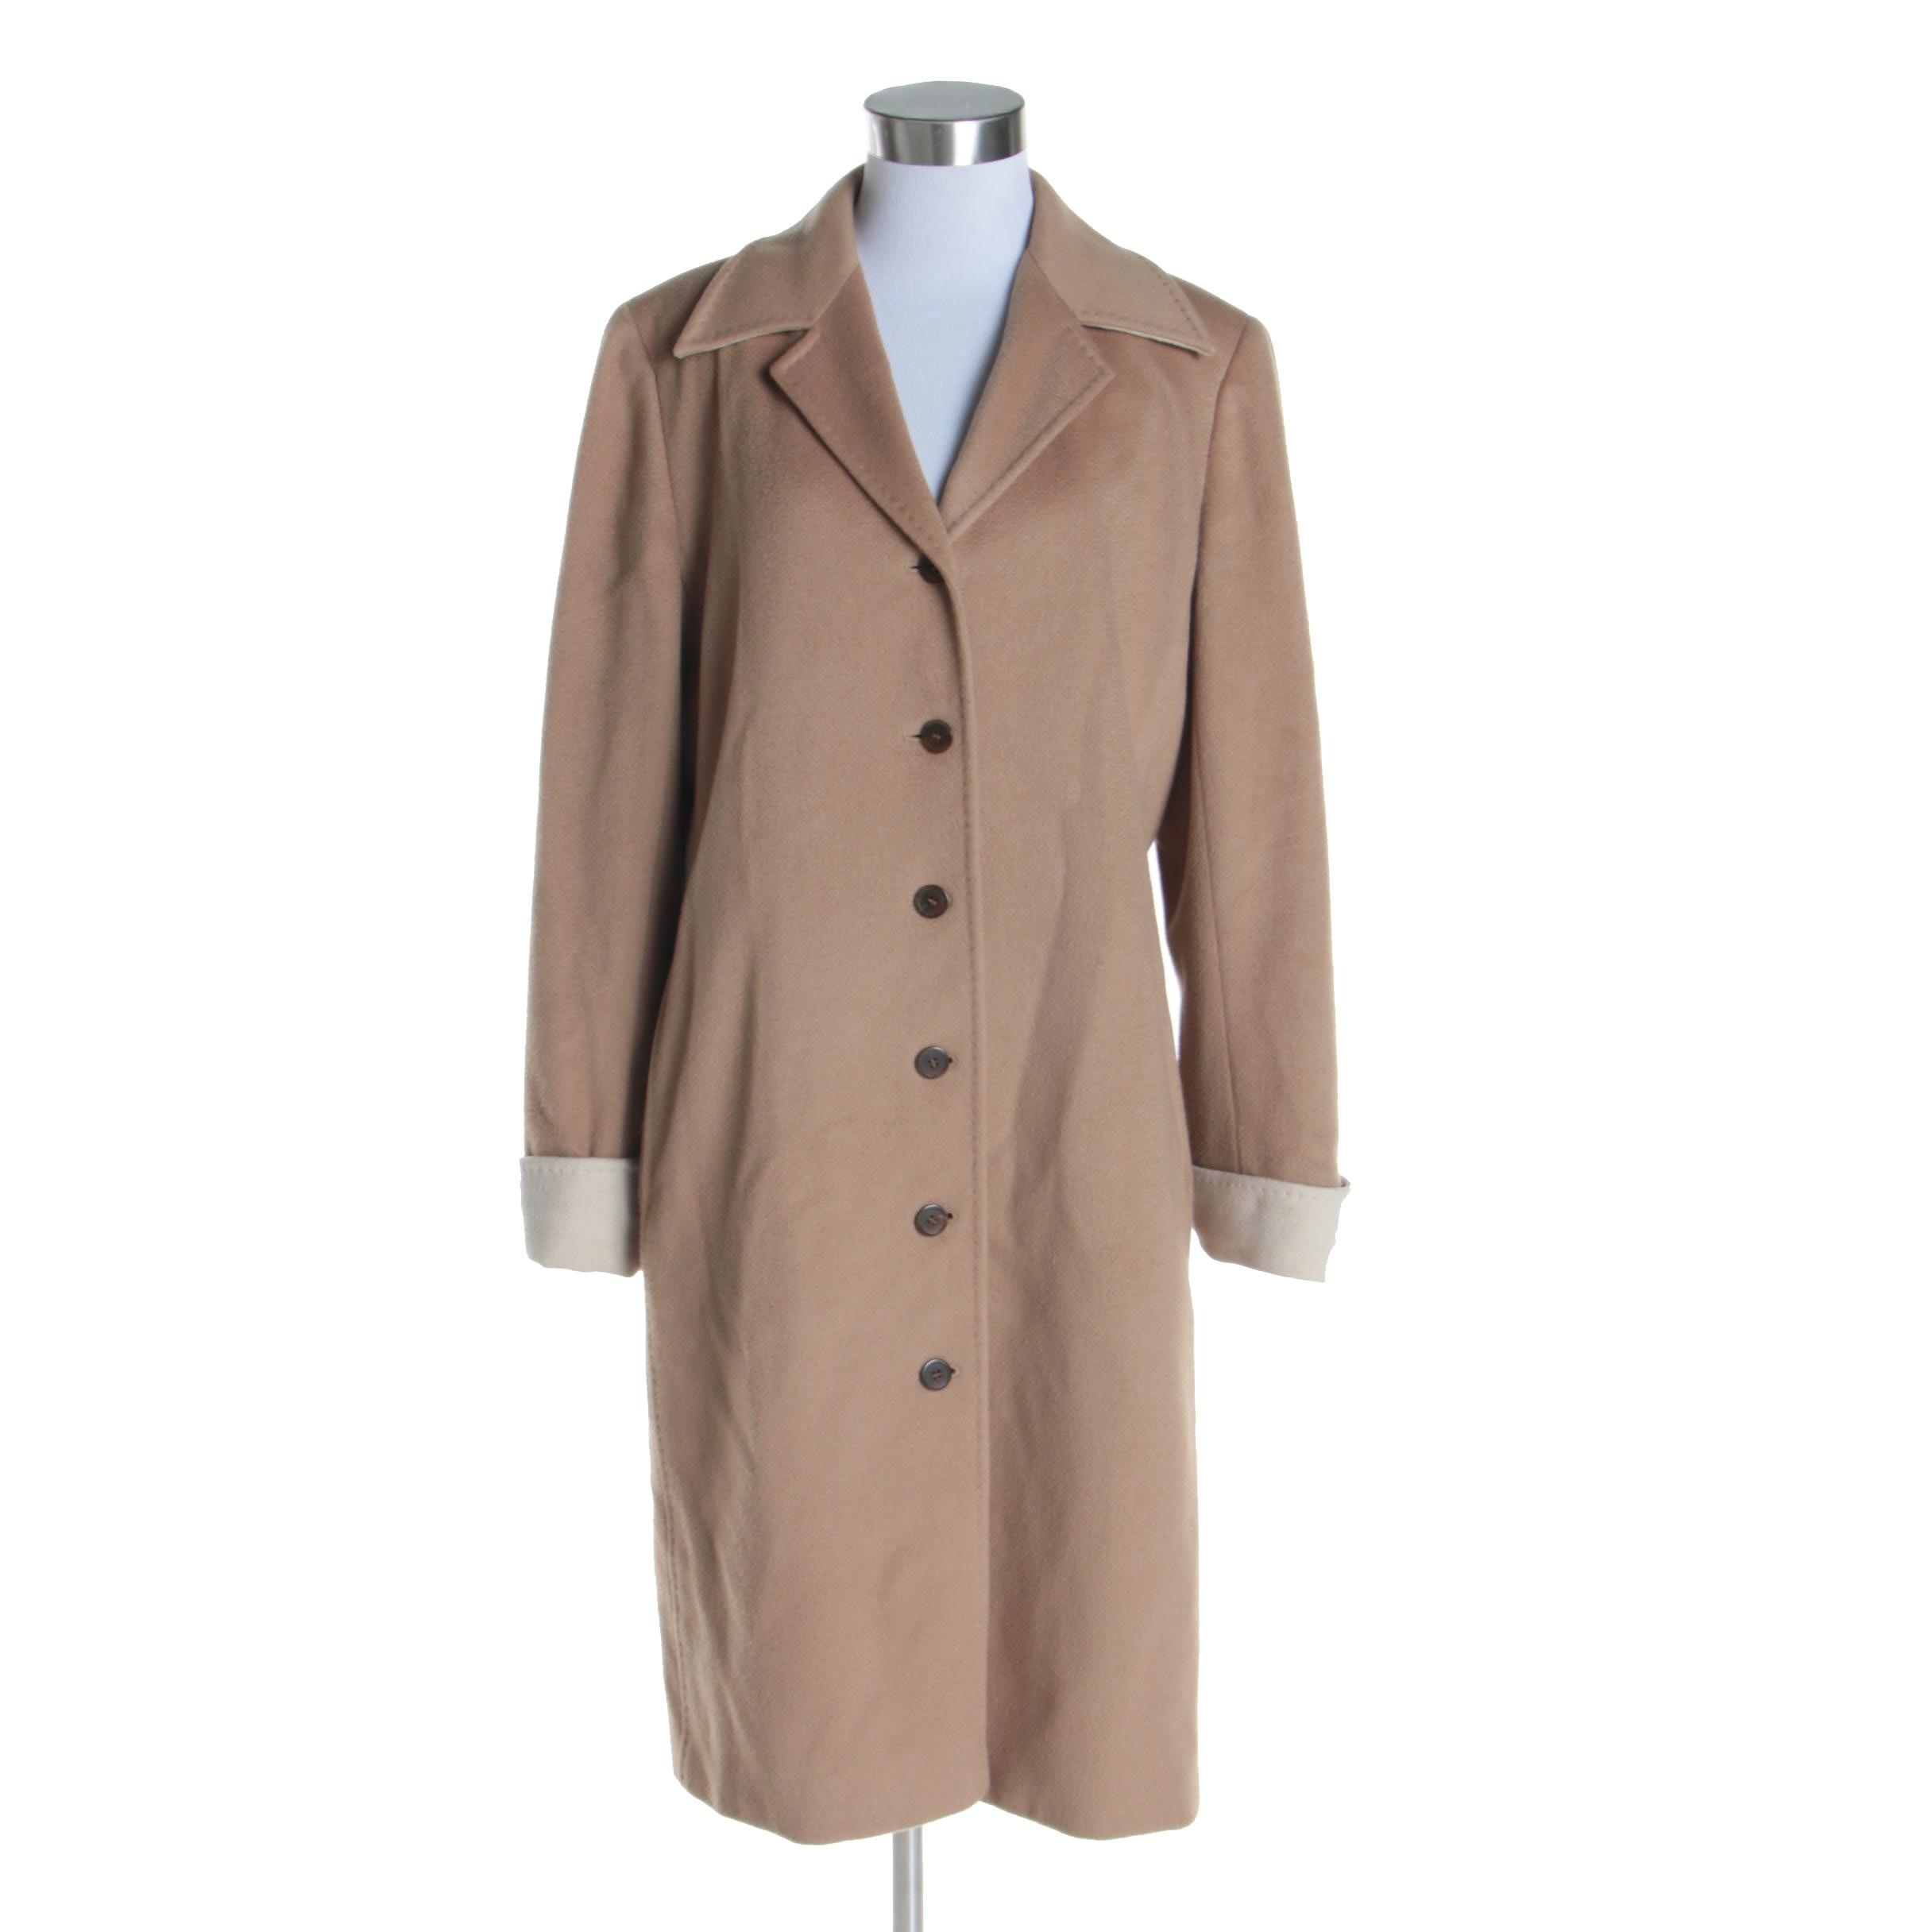 Women's Vintage Bill Blass Beige Cashmere Coat